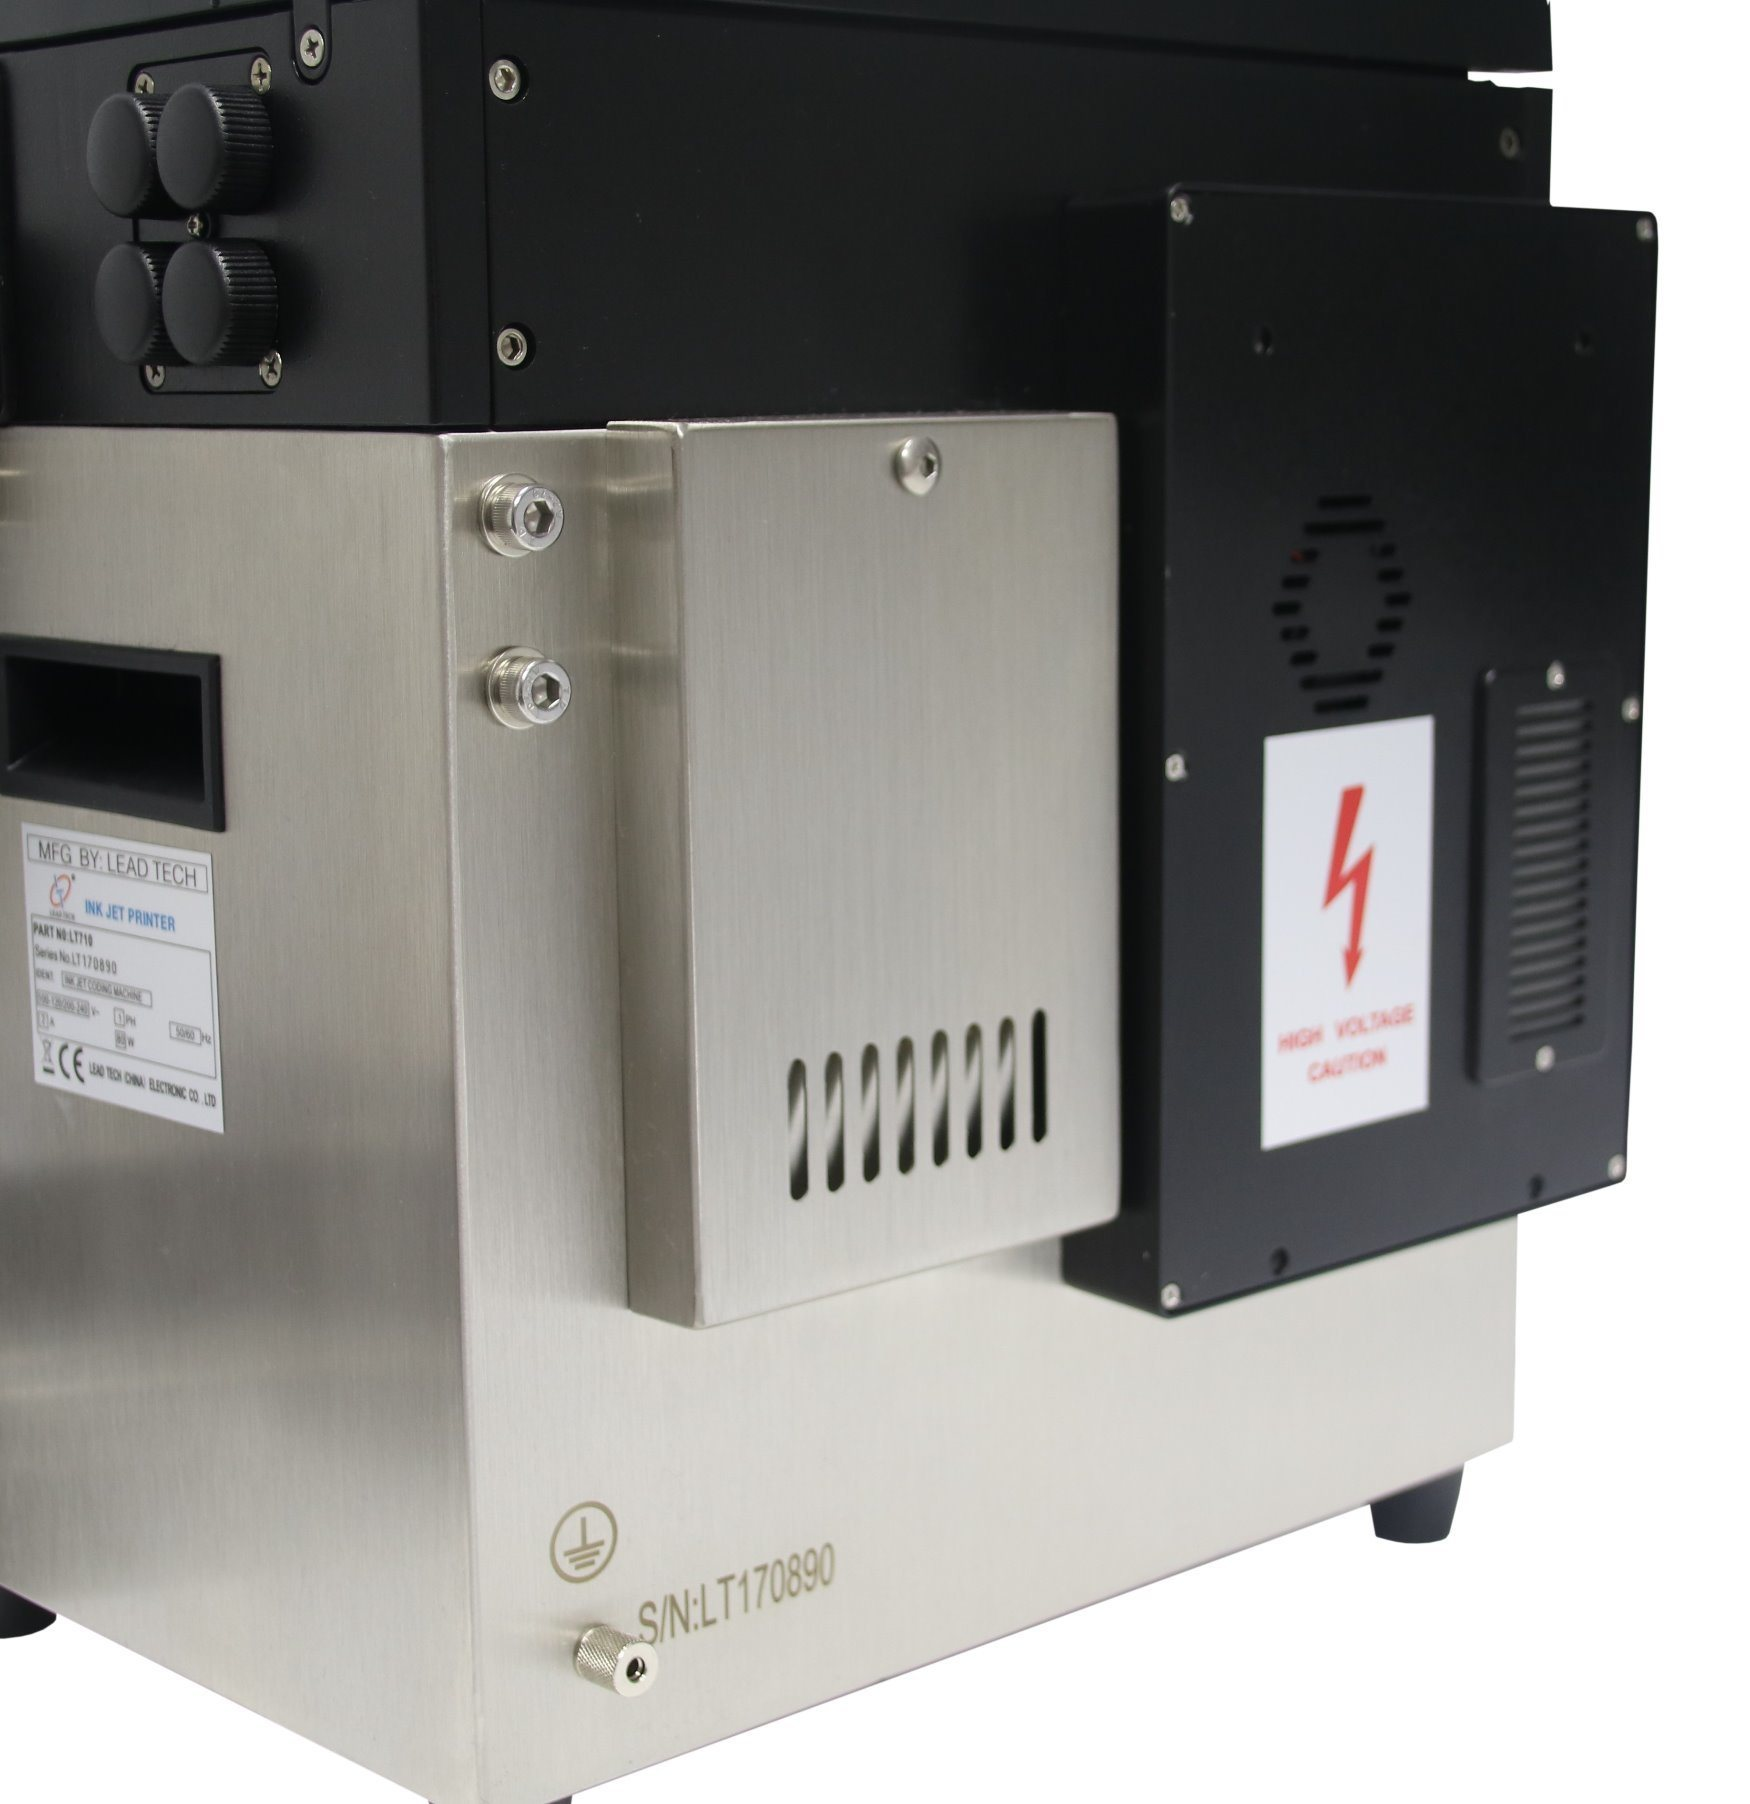 Lead Tech Cij Digital Printer for Cable Printing